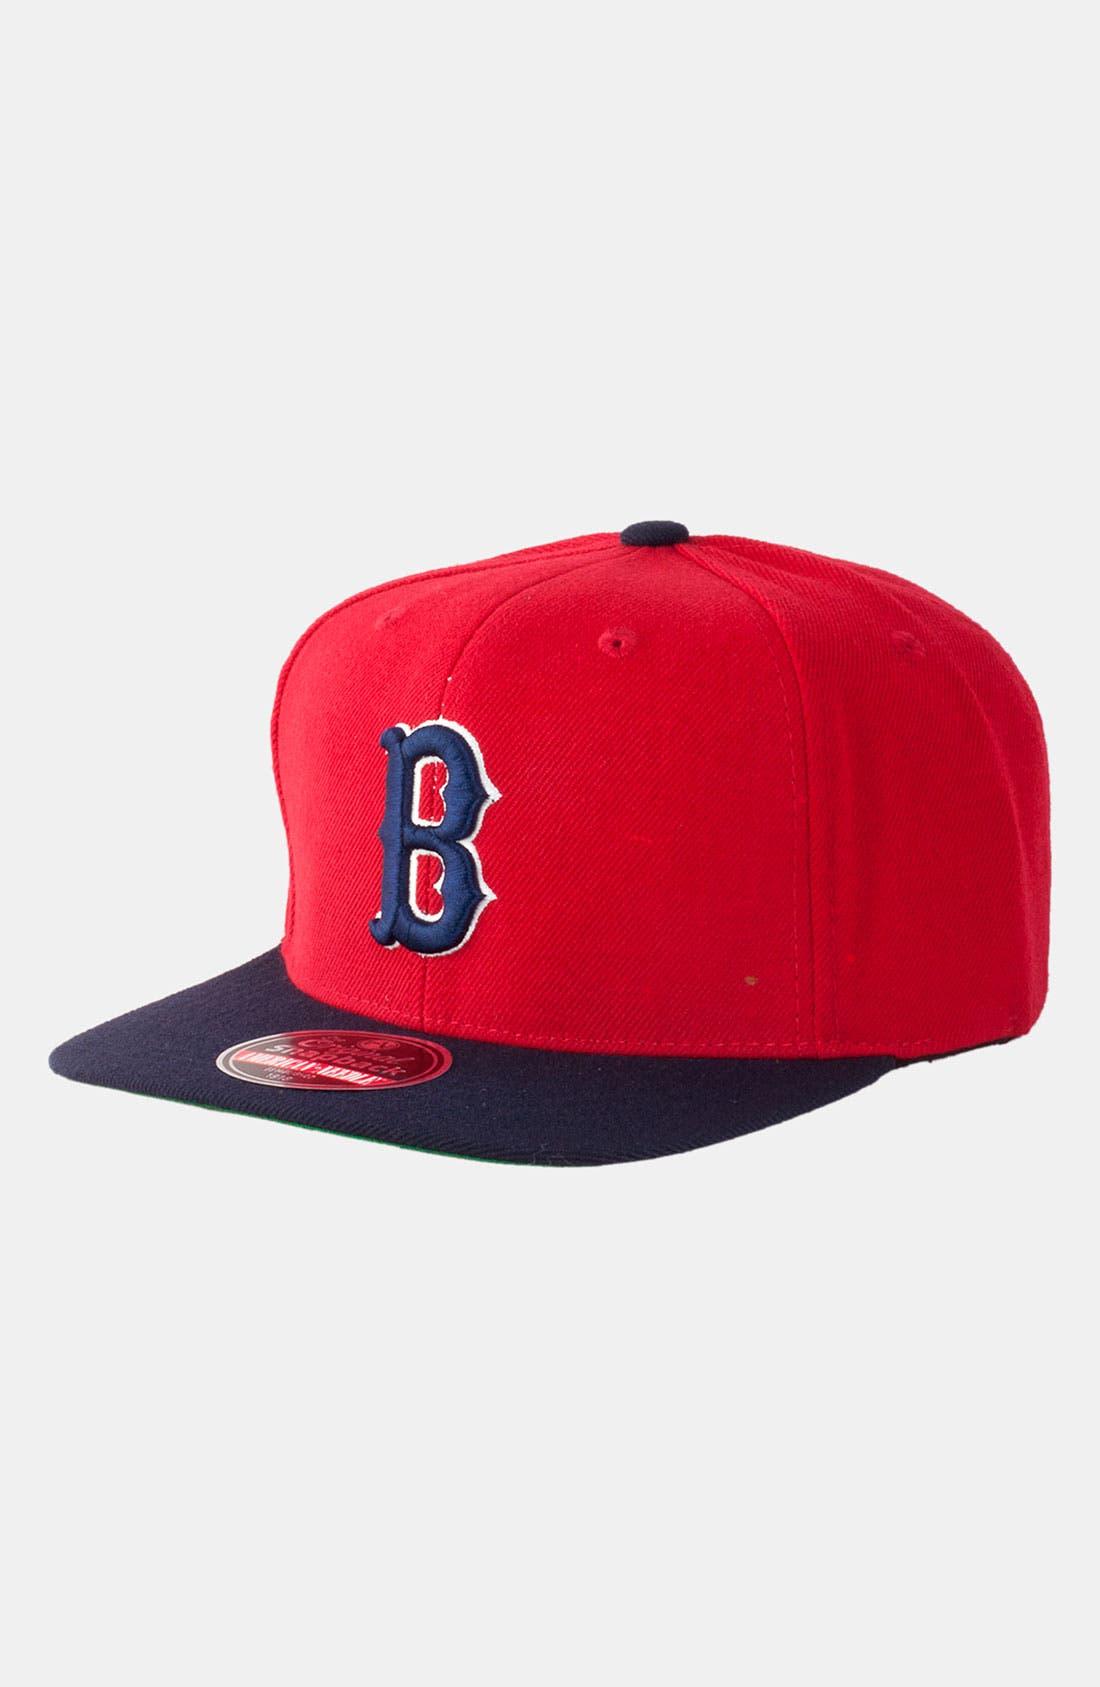 Main Image - American Needle 'Boston Red Sox - Cooperstown' Snapback Baseball Cap